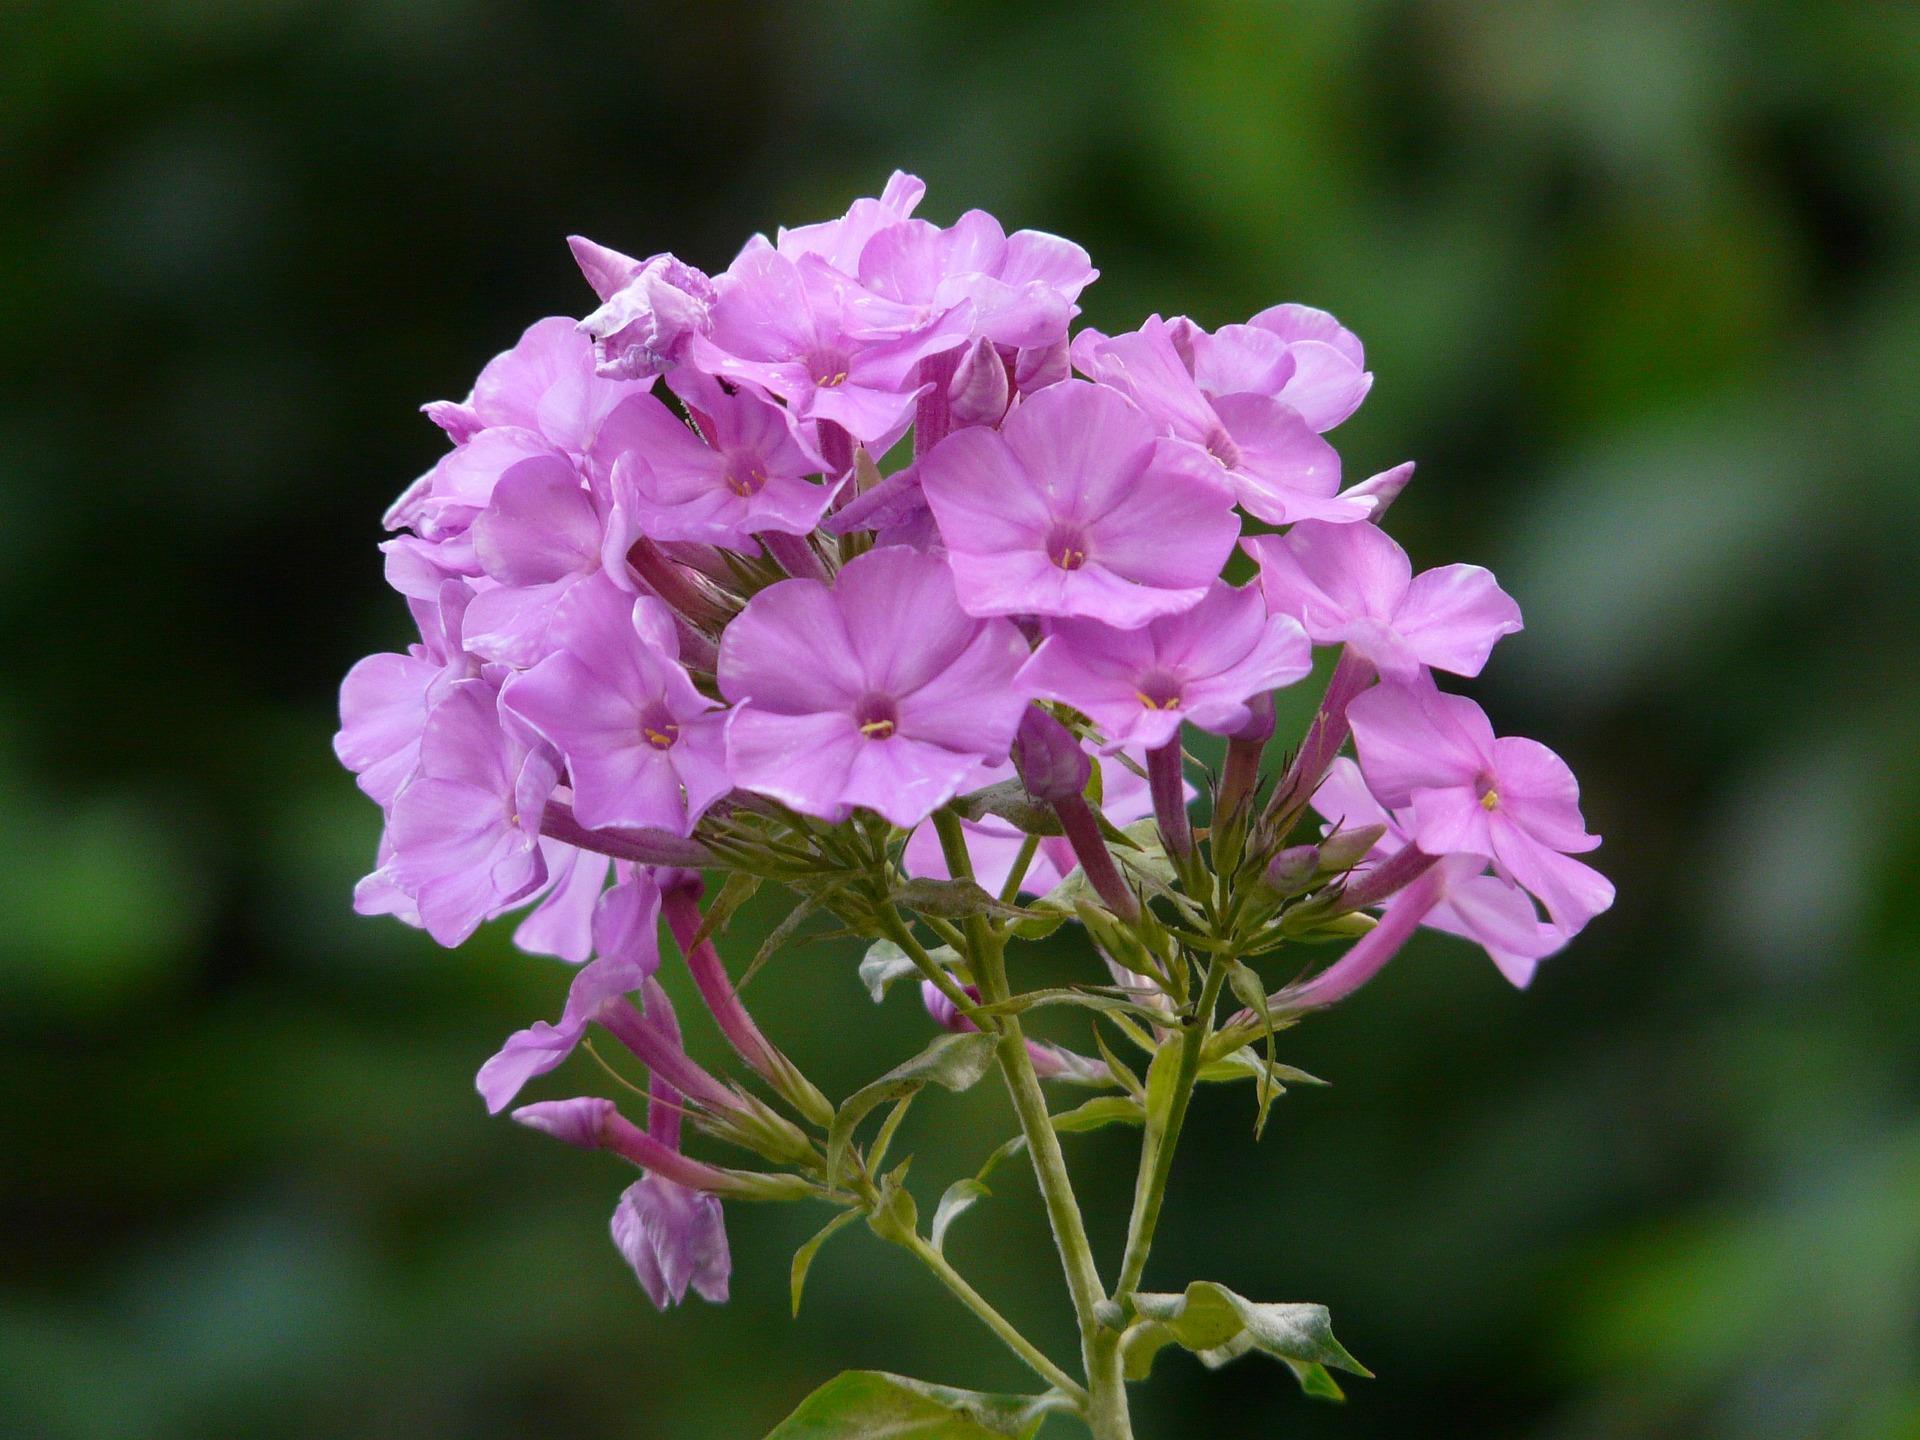 Pink purple tall phlox flower